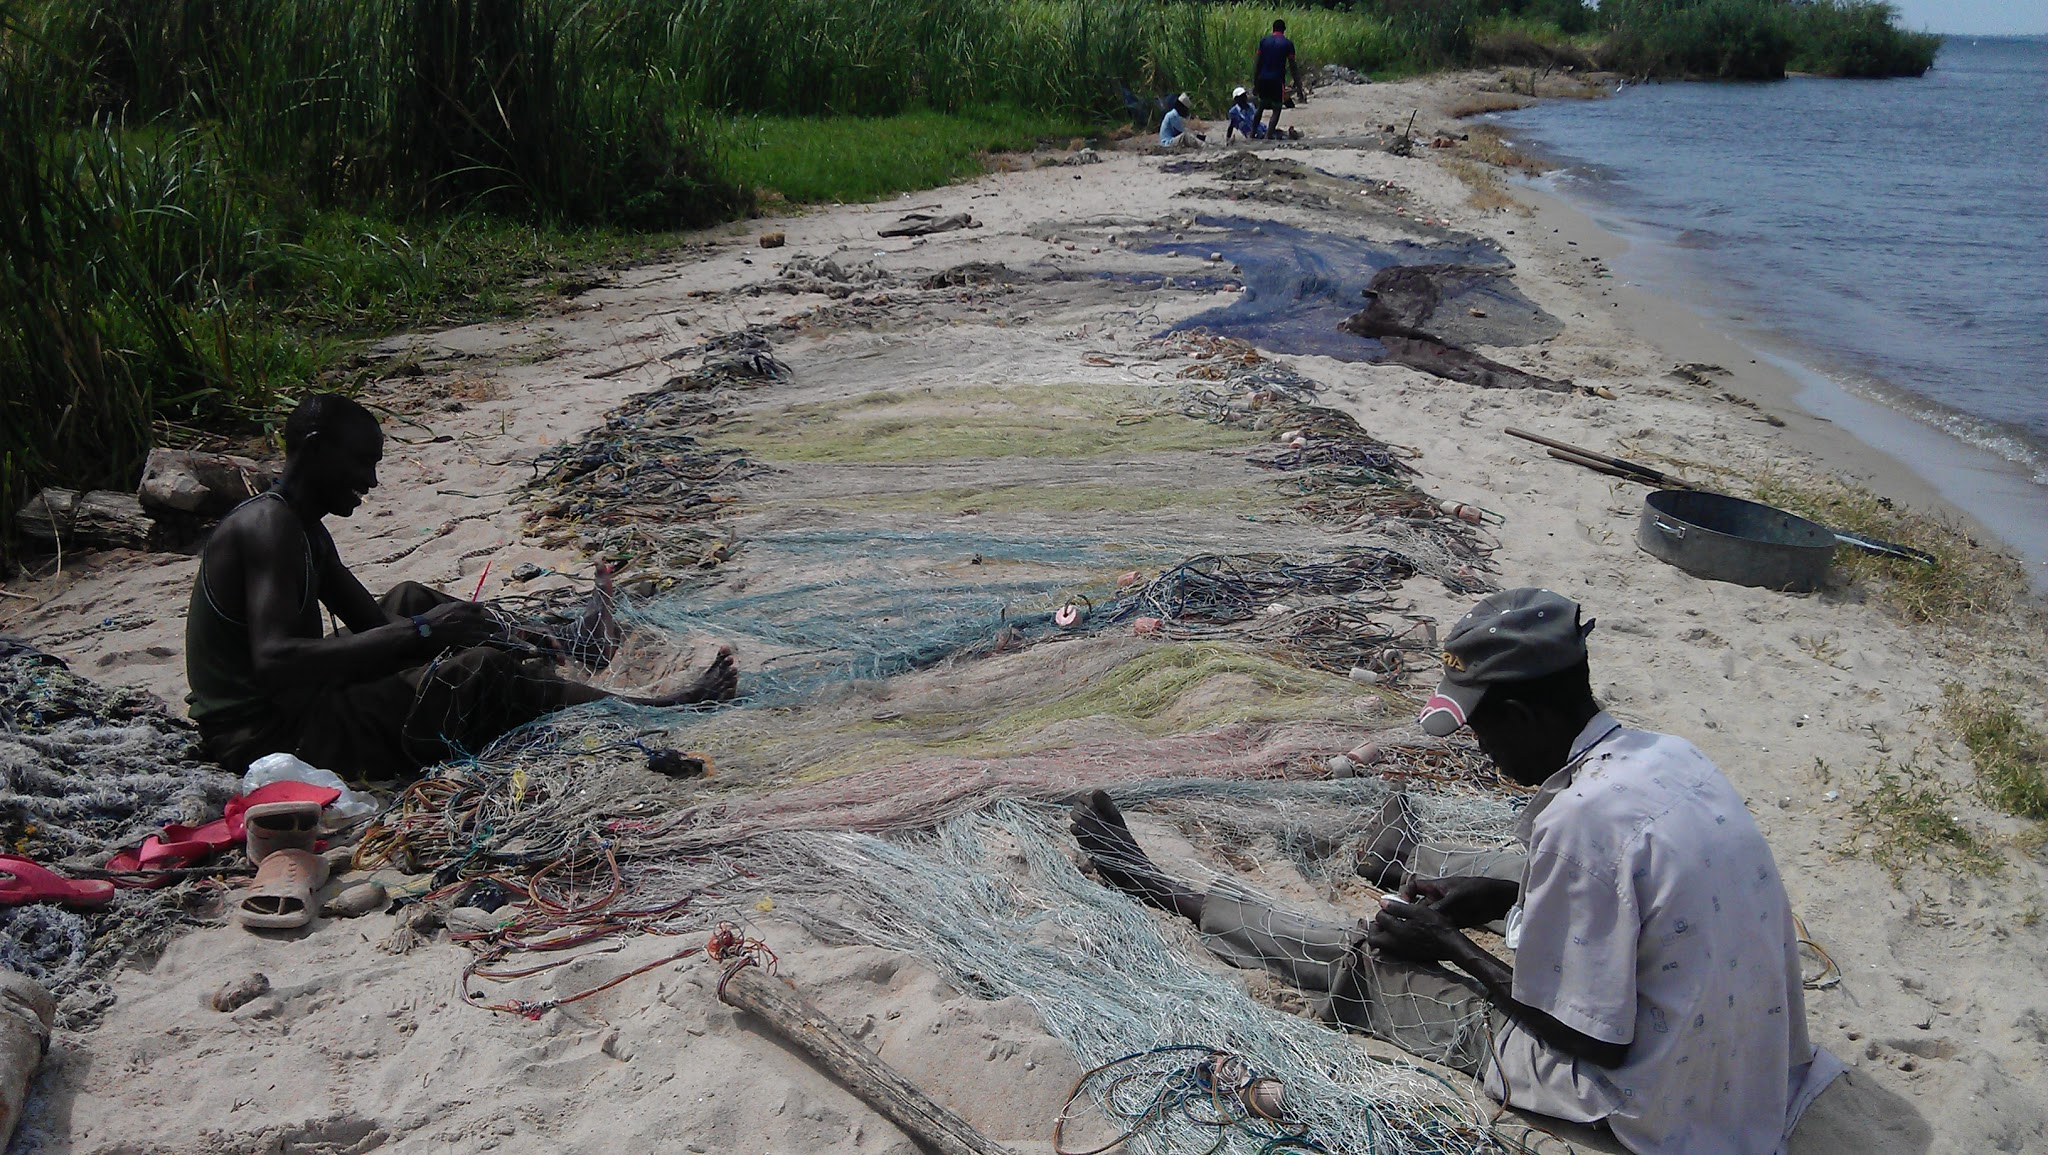 Fishermen repairing nets on the banks of Lake Vic